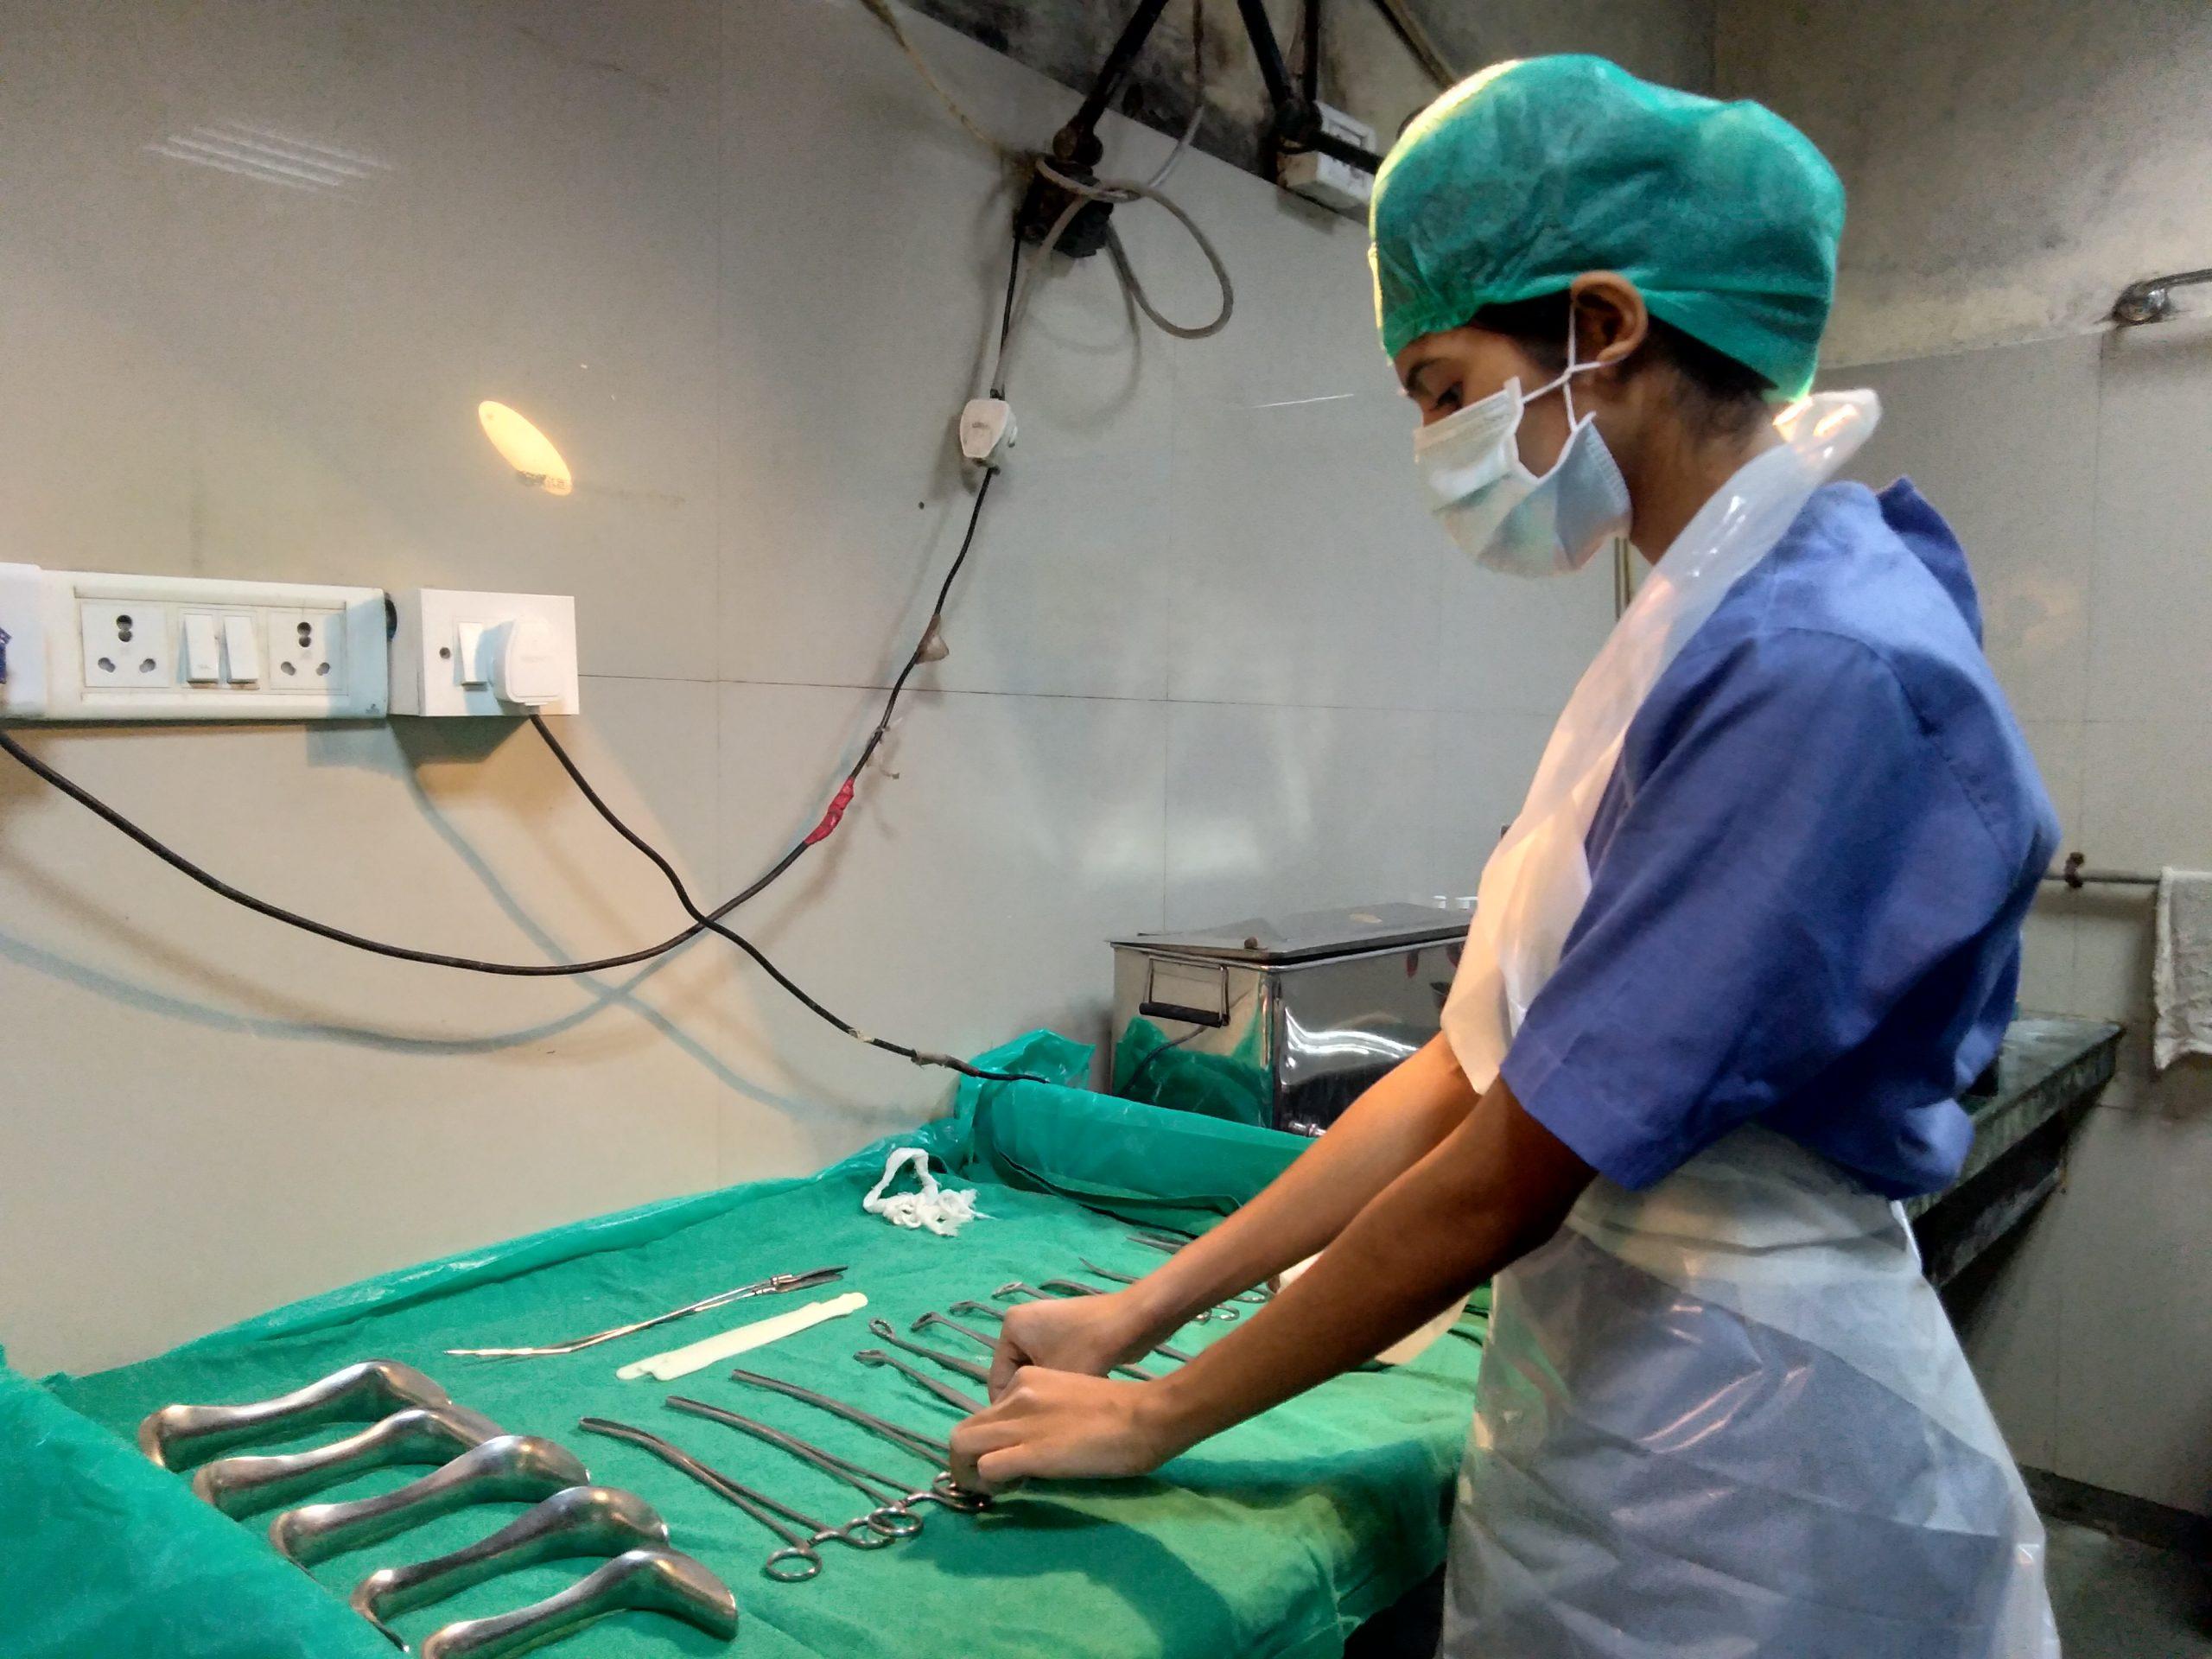 A nurse preparing tools in operation theatre